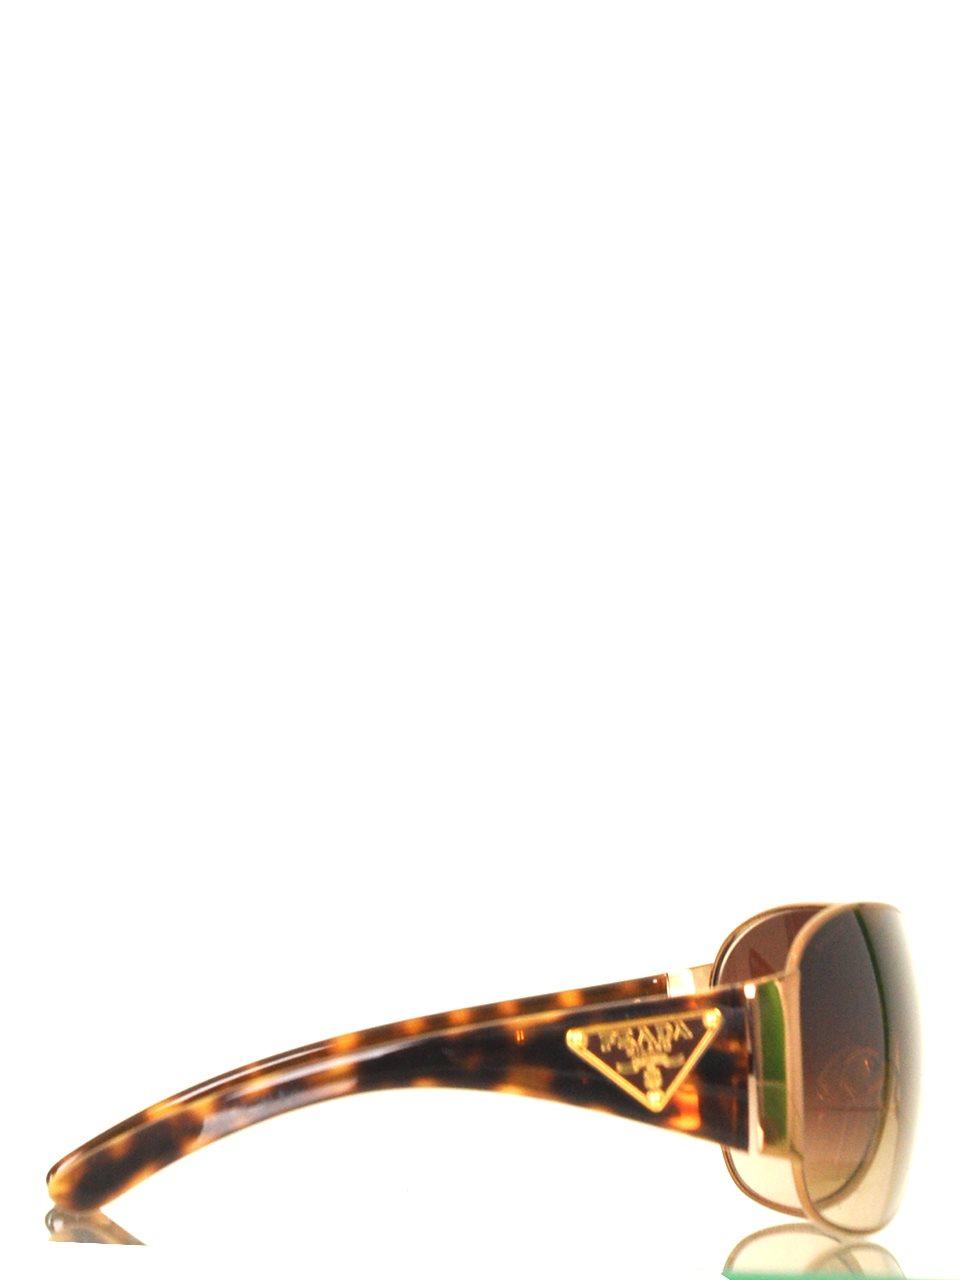 Prada - Sunglasses - Image 5 of 5